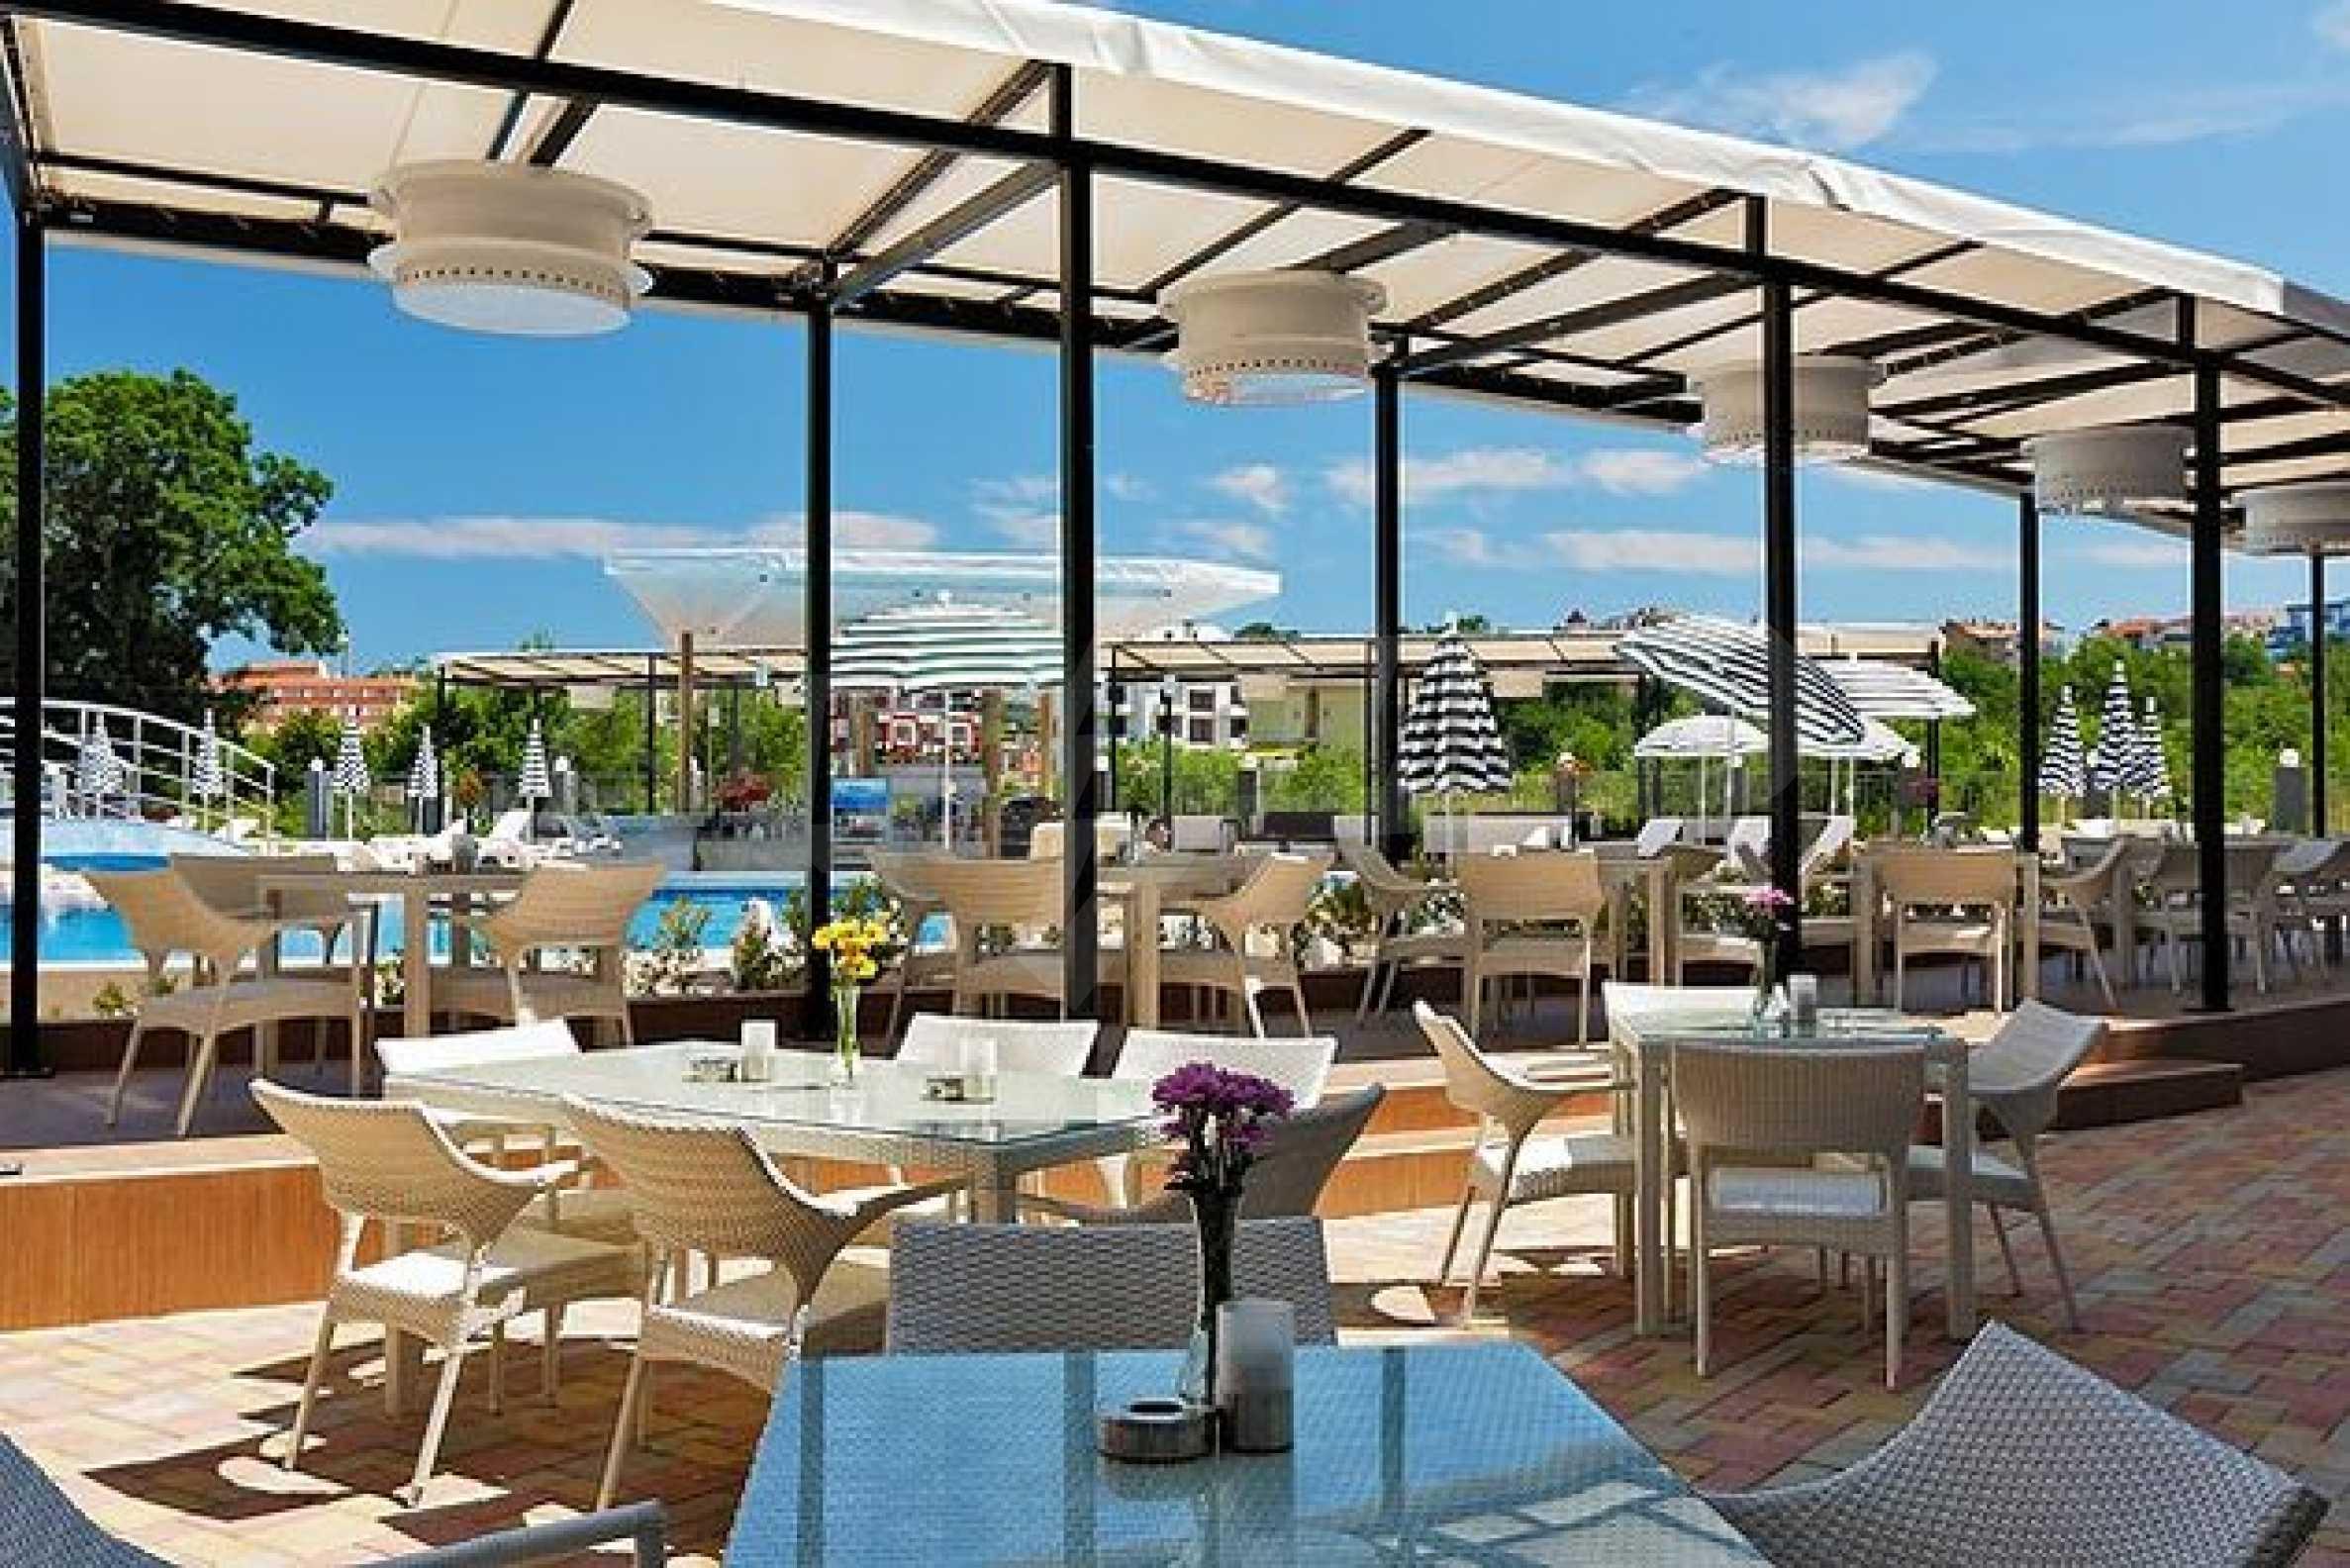 Emberli Park Bar & Diner in the beach resort of Lozenets 1